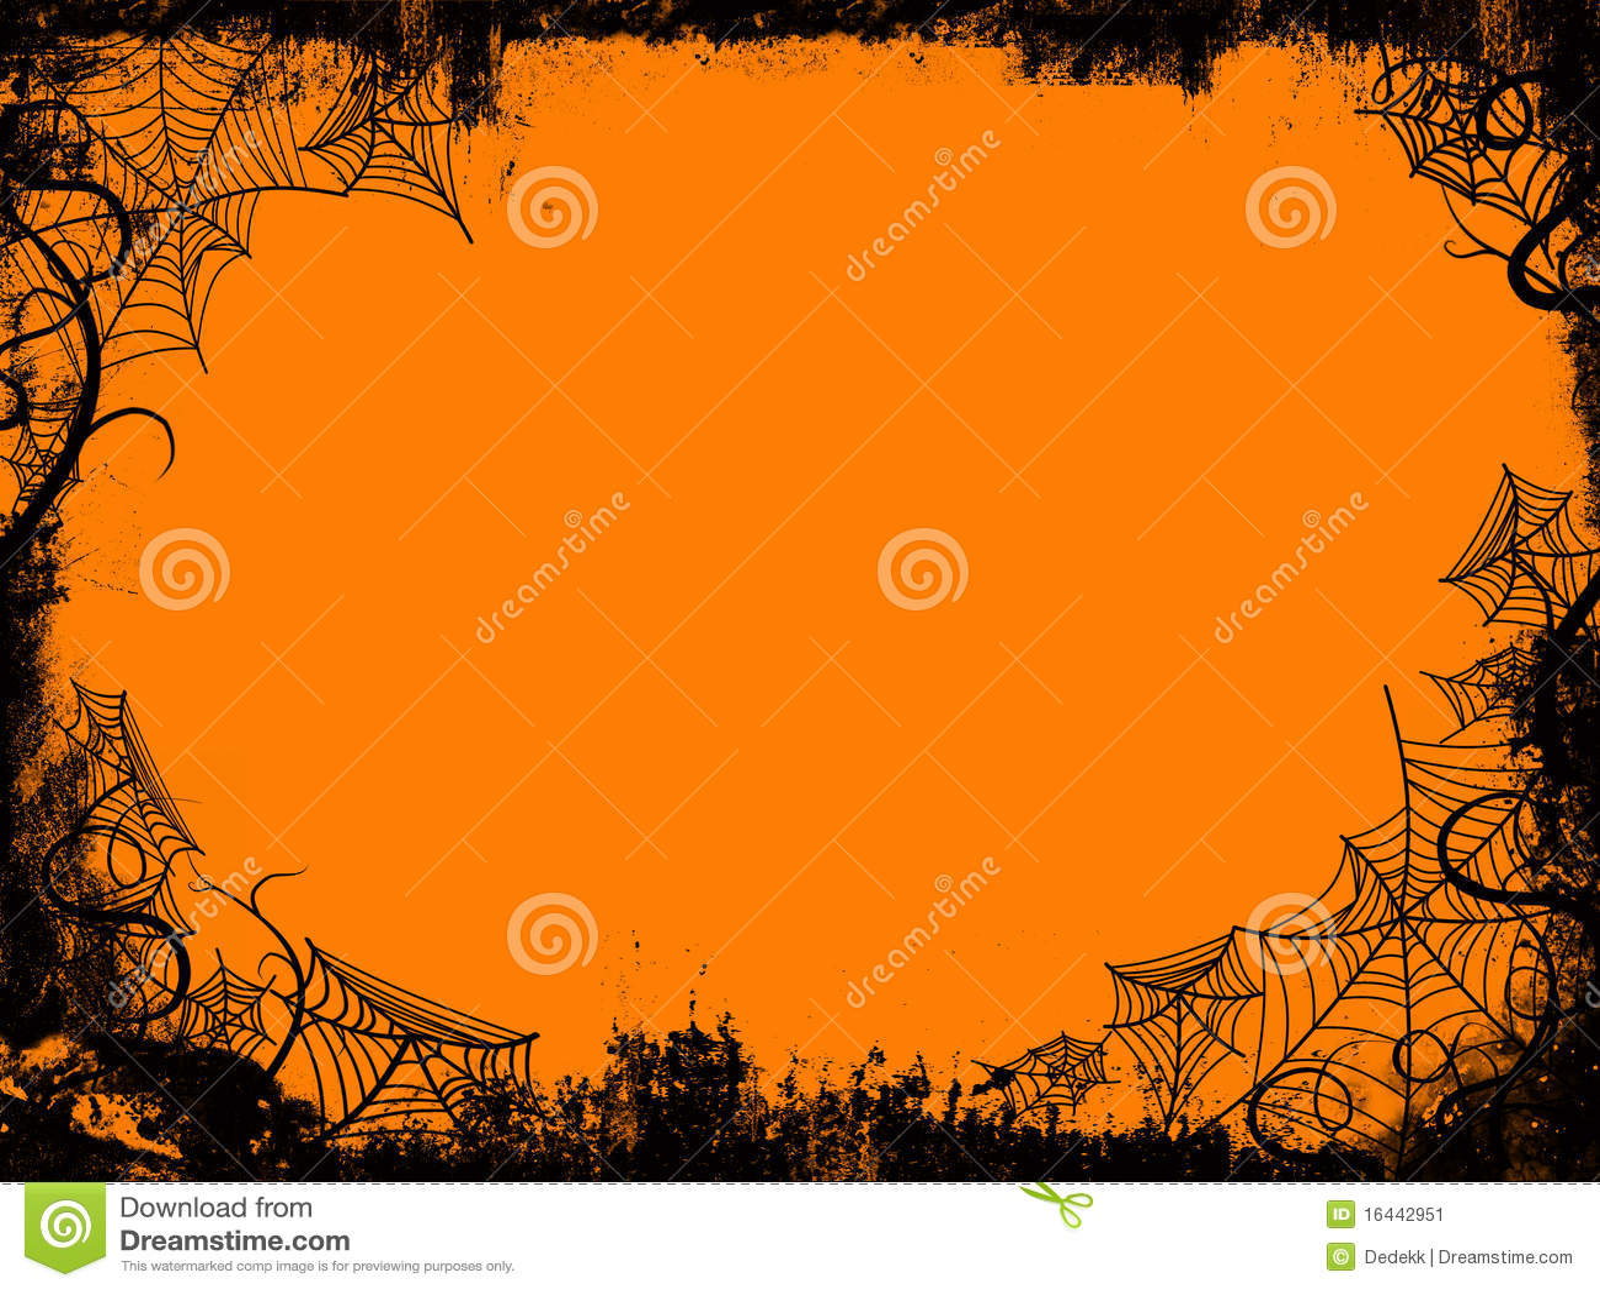 Halloween frame withspider webs on orange background.